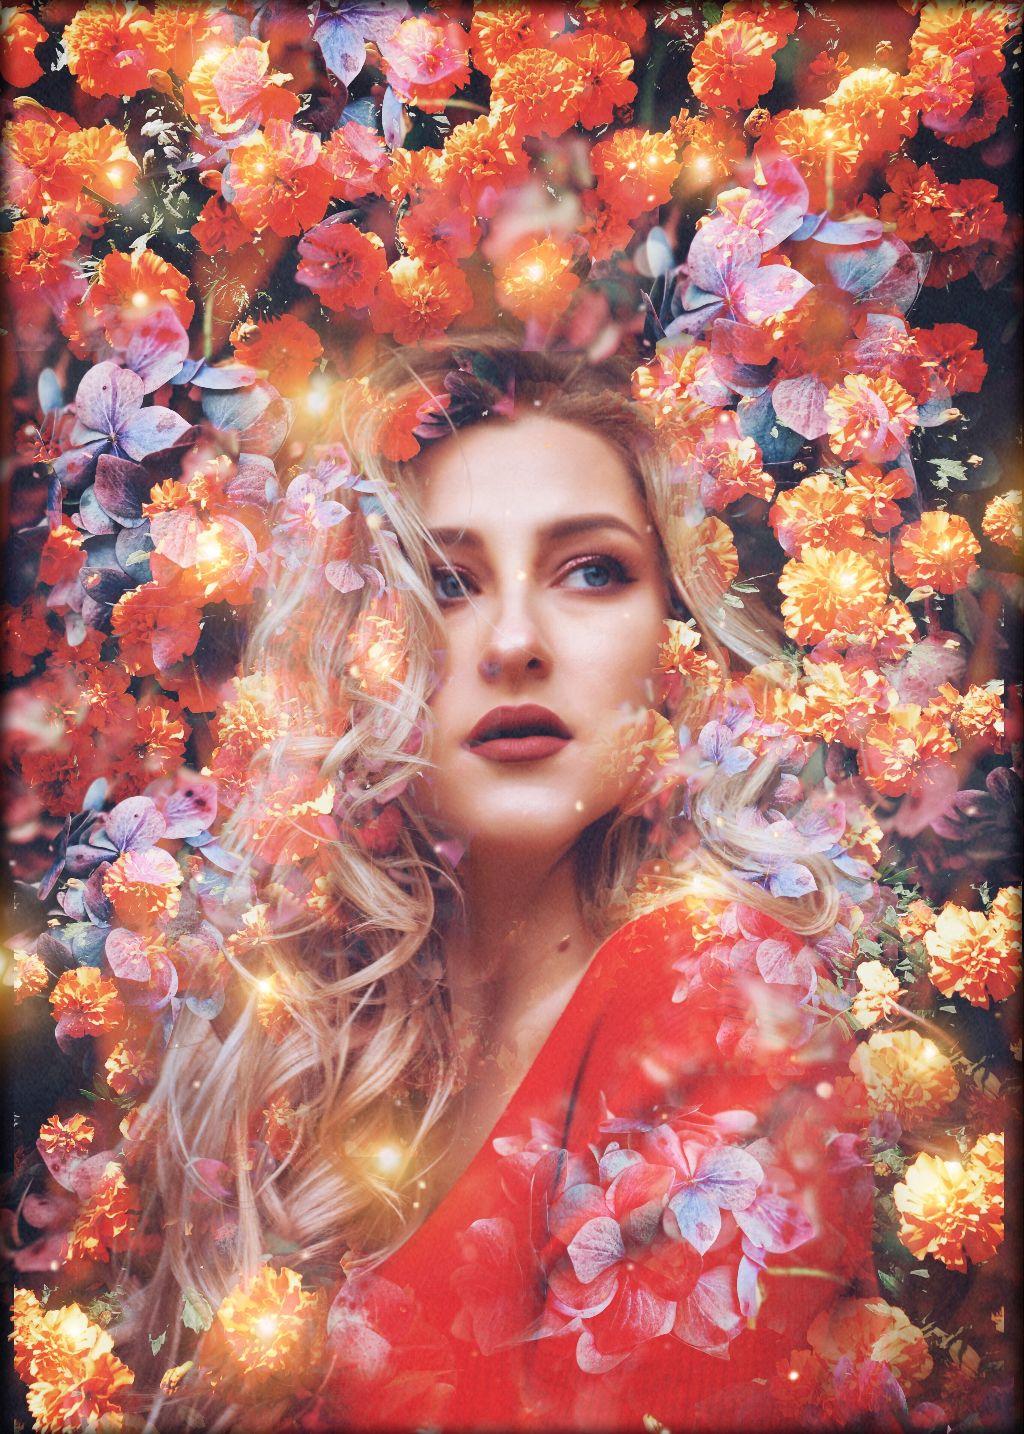 🌸🌸 #freetoedit #doubleexposure #floweredit #unsplash